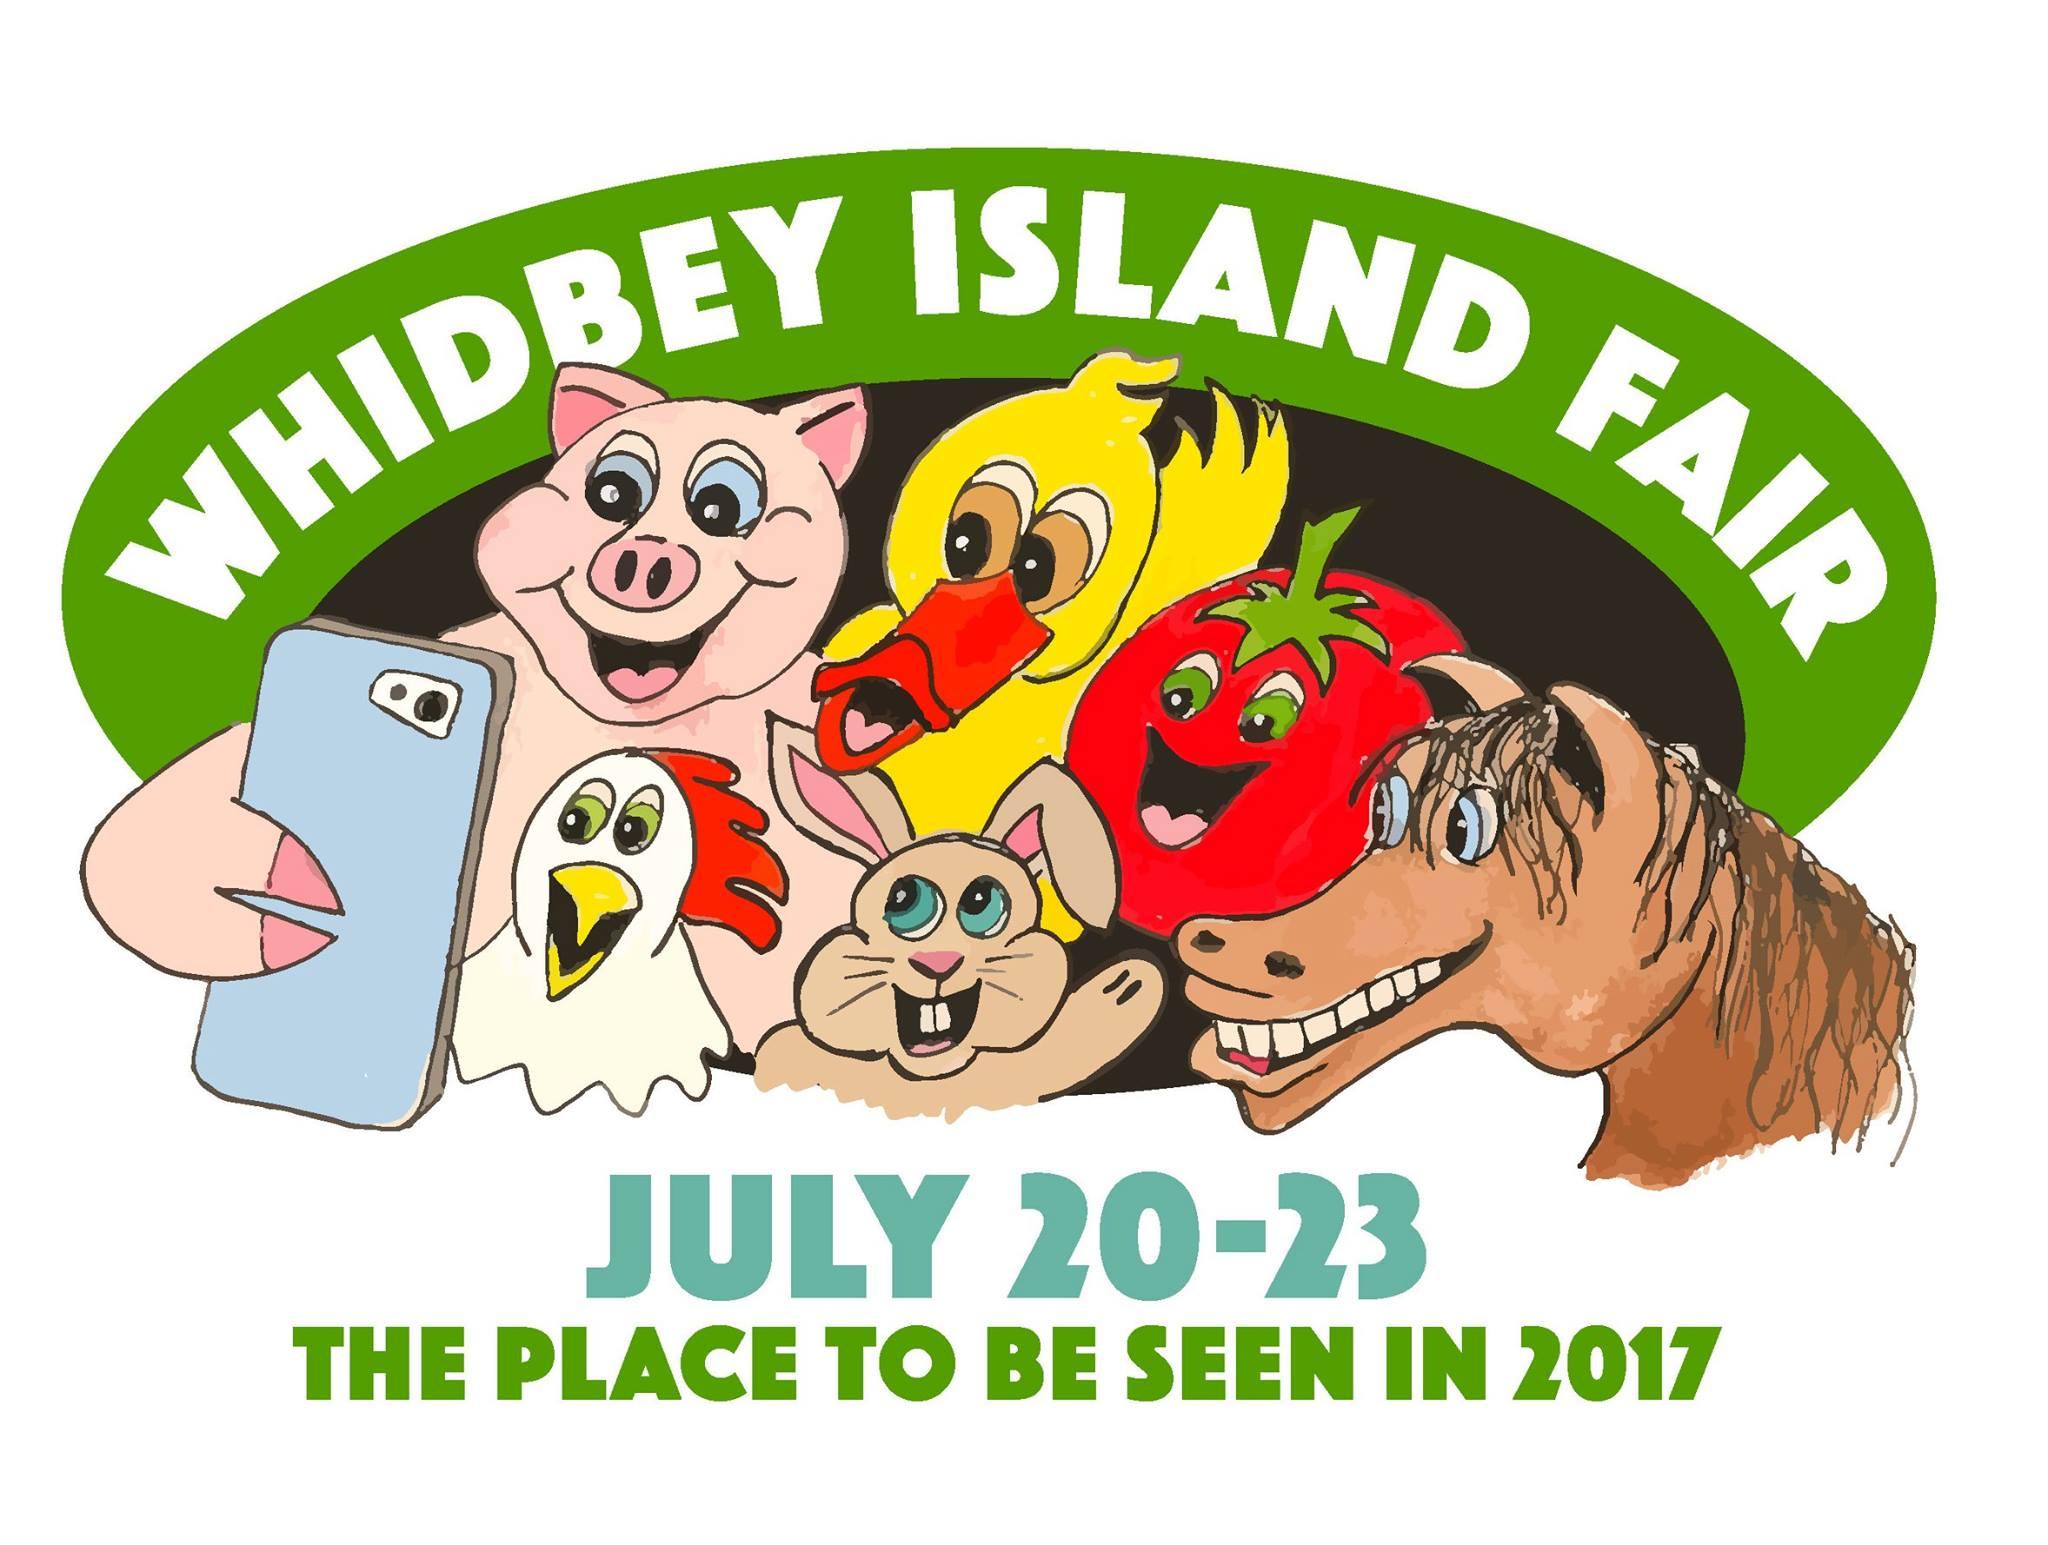 Whidbey Island Area Fair.